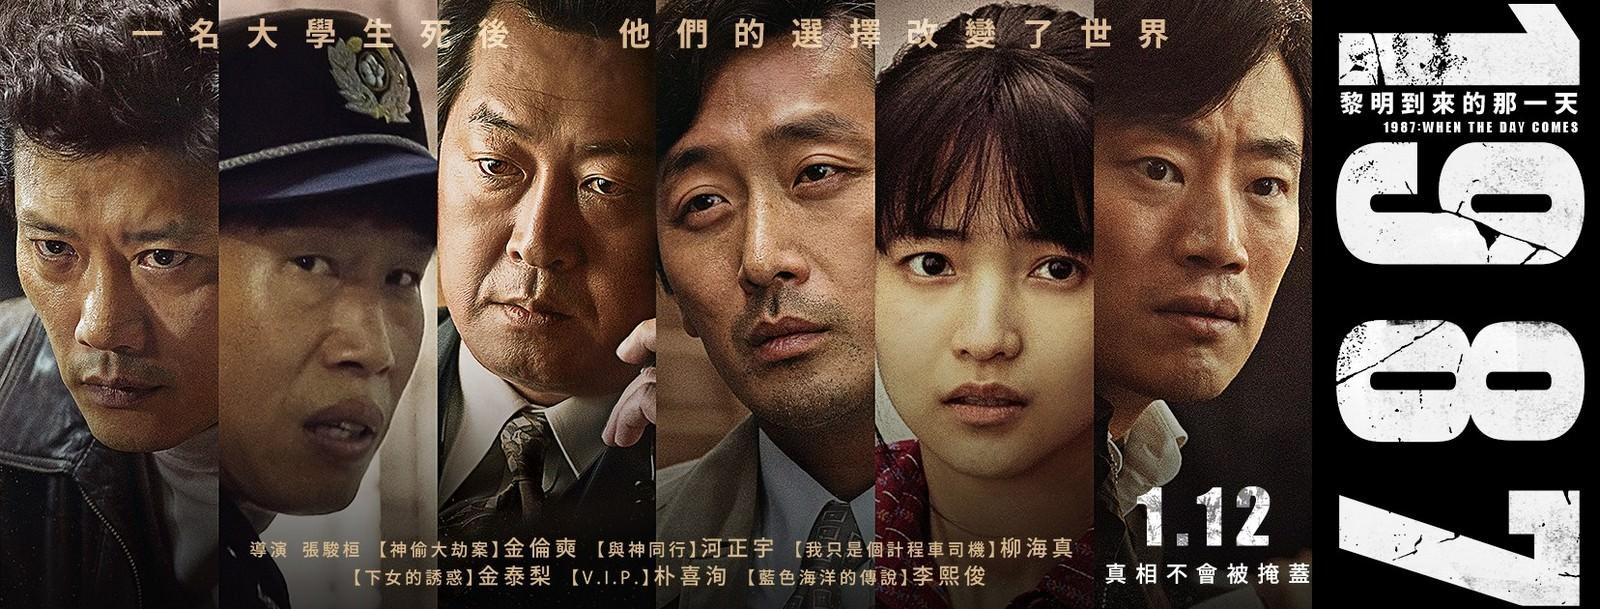 Movie, 1987(韓國, 2017) / 1987:黎明到來的那一天(台灣) / 1987: When The Day Comes(英文), 電影海報, 台灣, 橫版